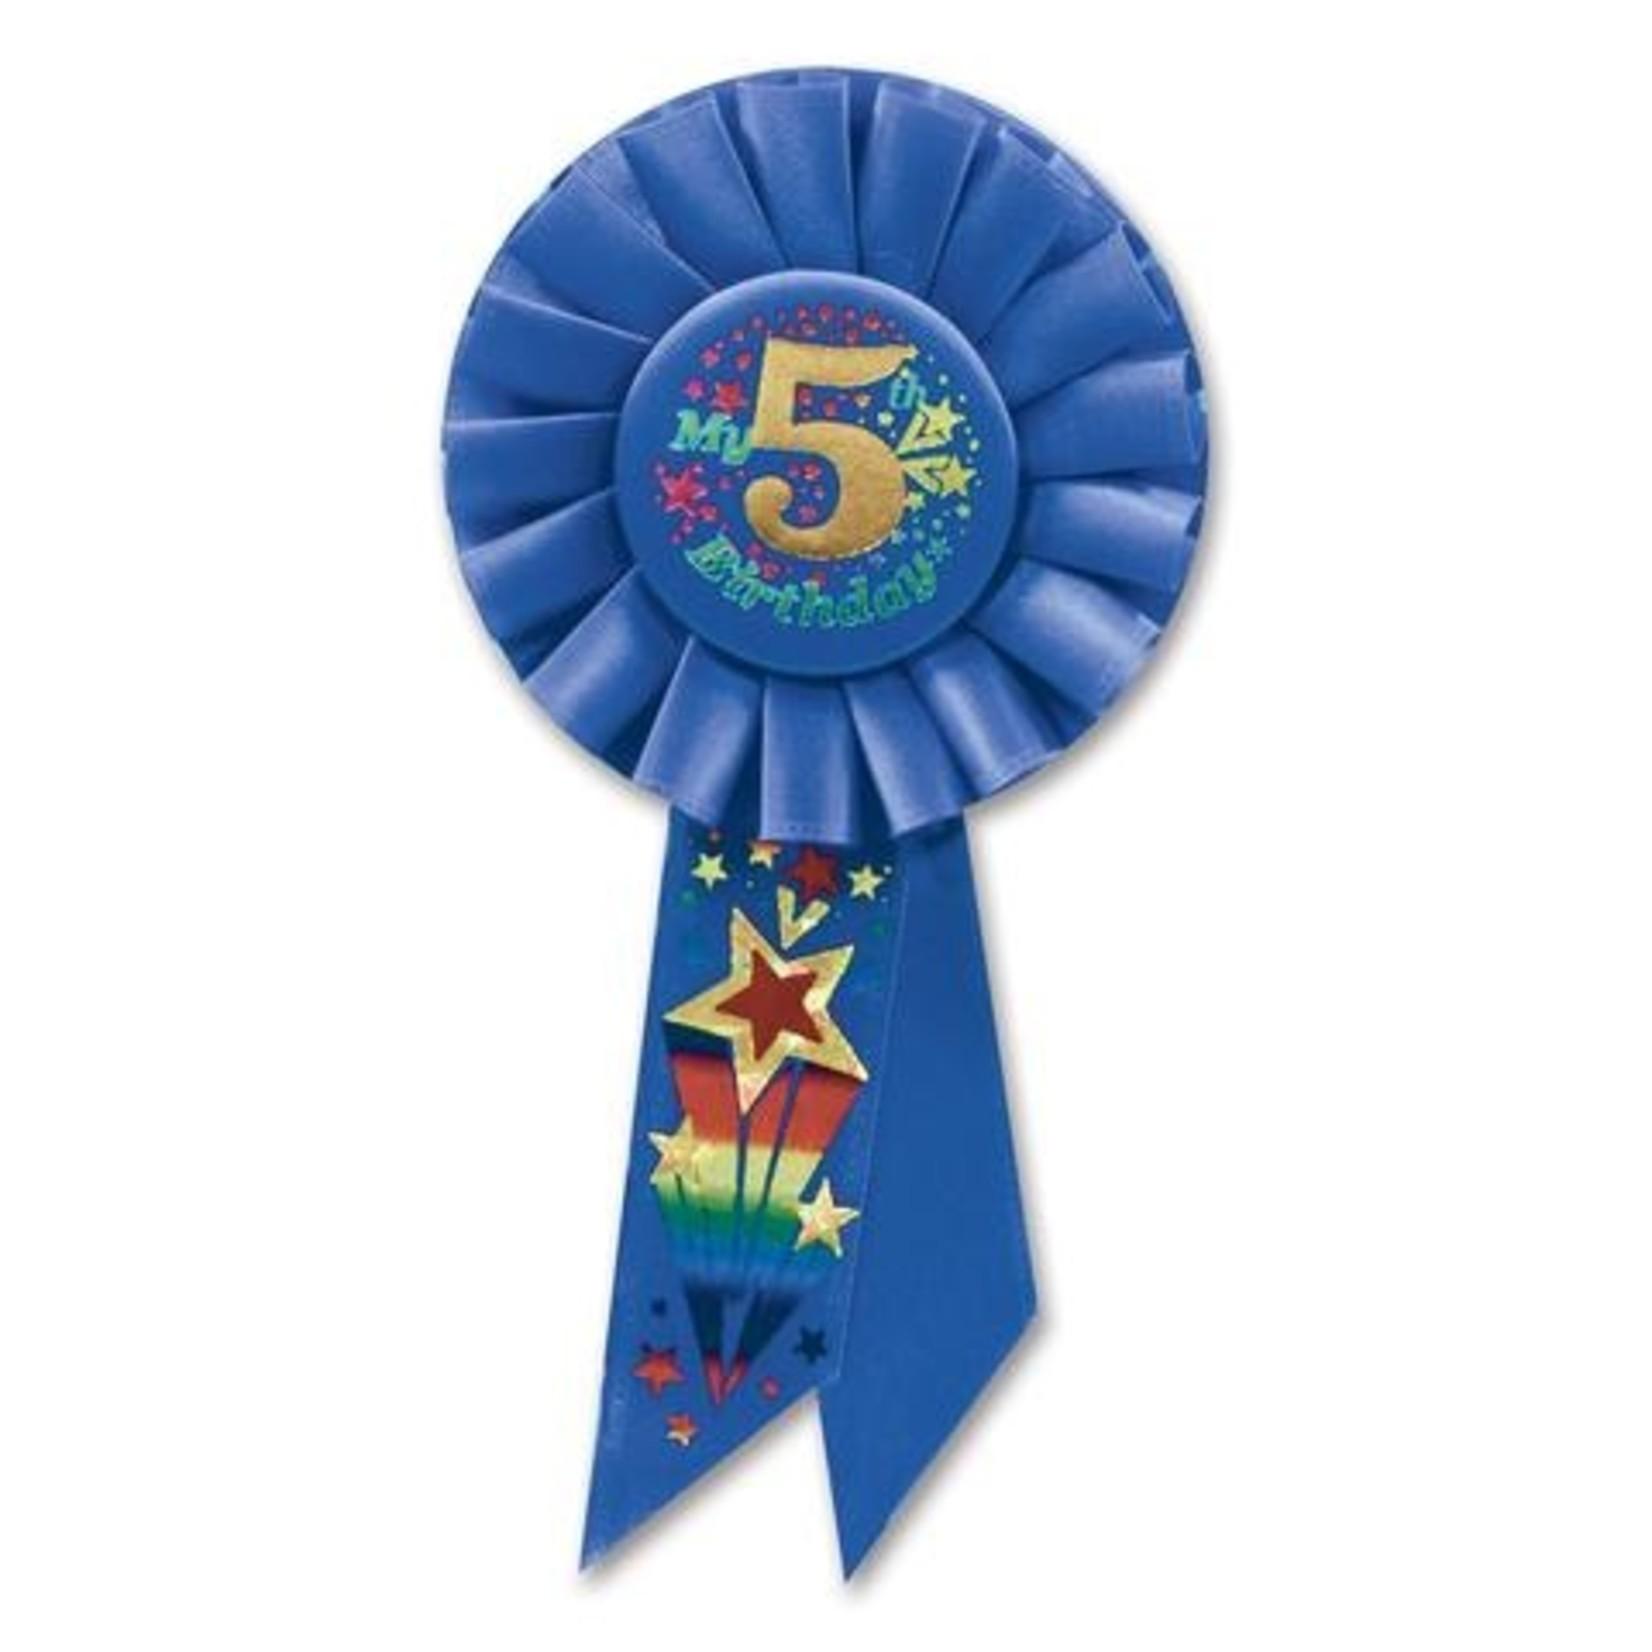 Award Ribbon - 5th Birthday